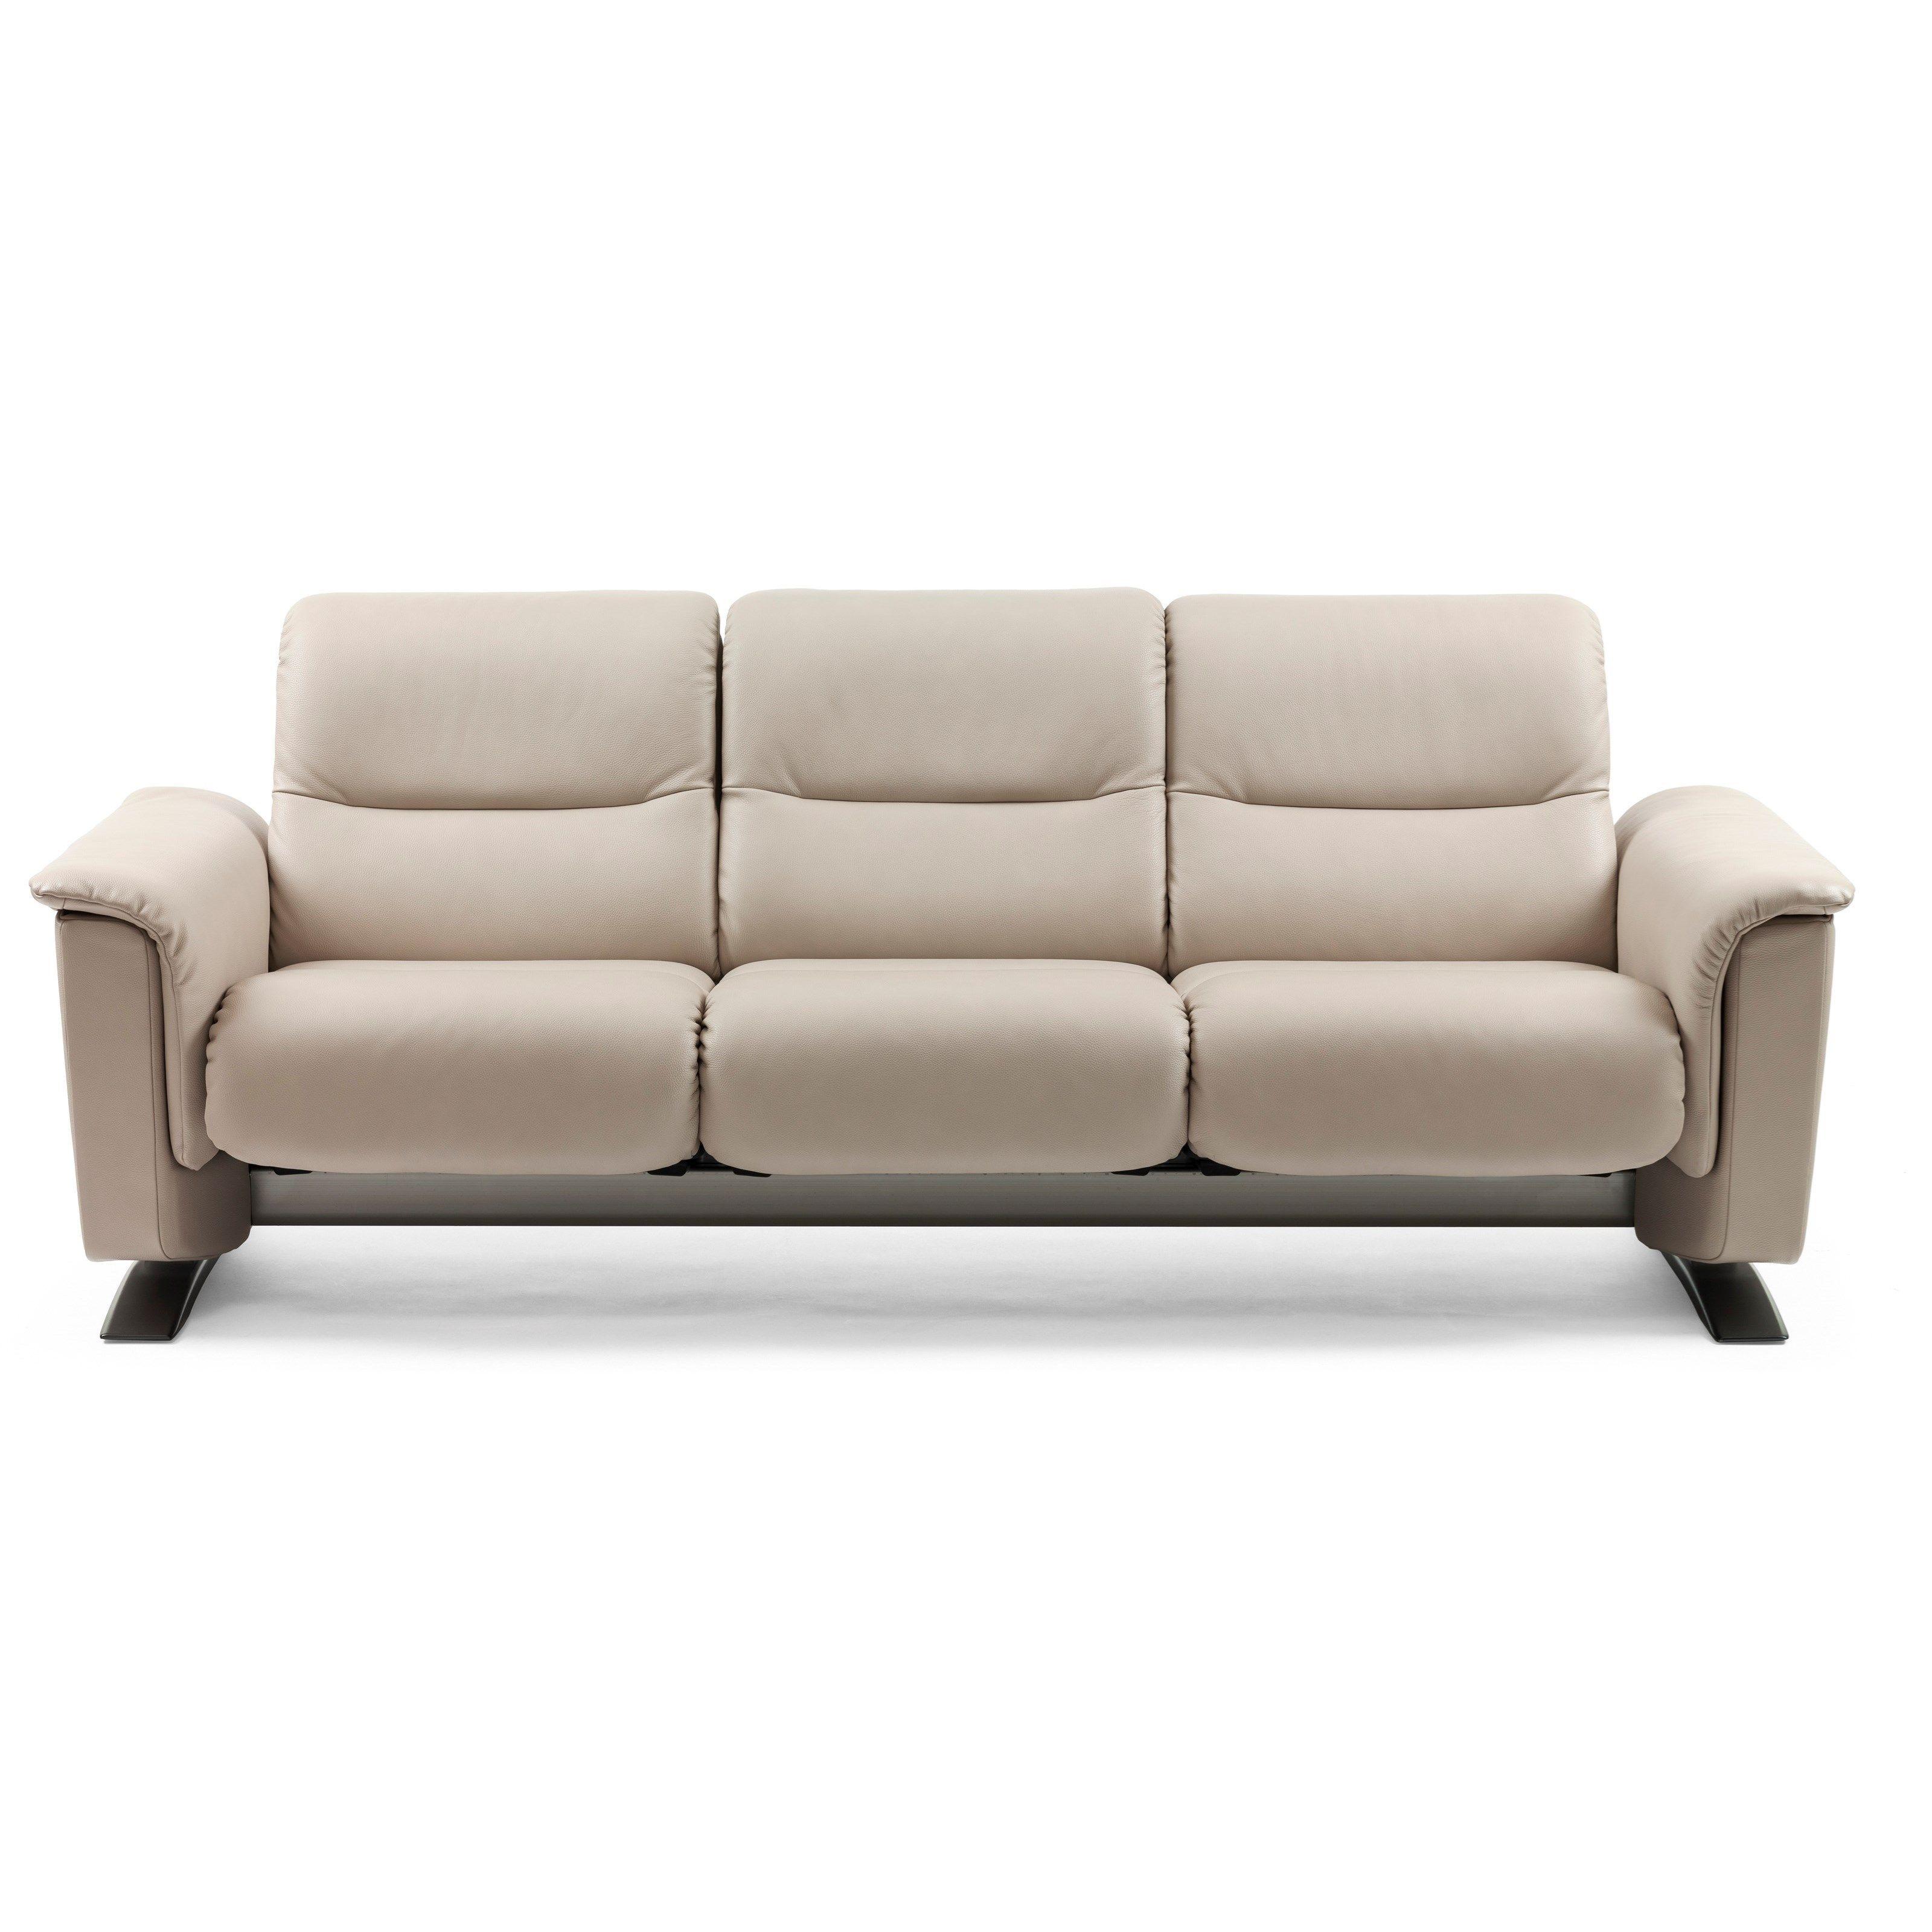 Stressless Chair Similar Fishing Bed Legs Panorama 3 Seater Sofa By Ekornes